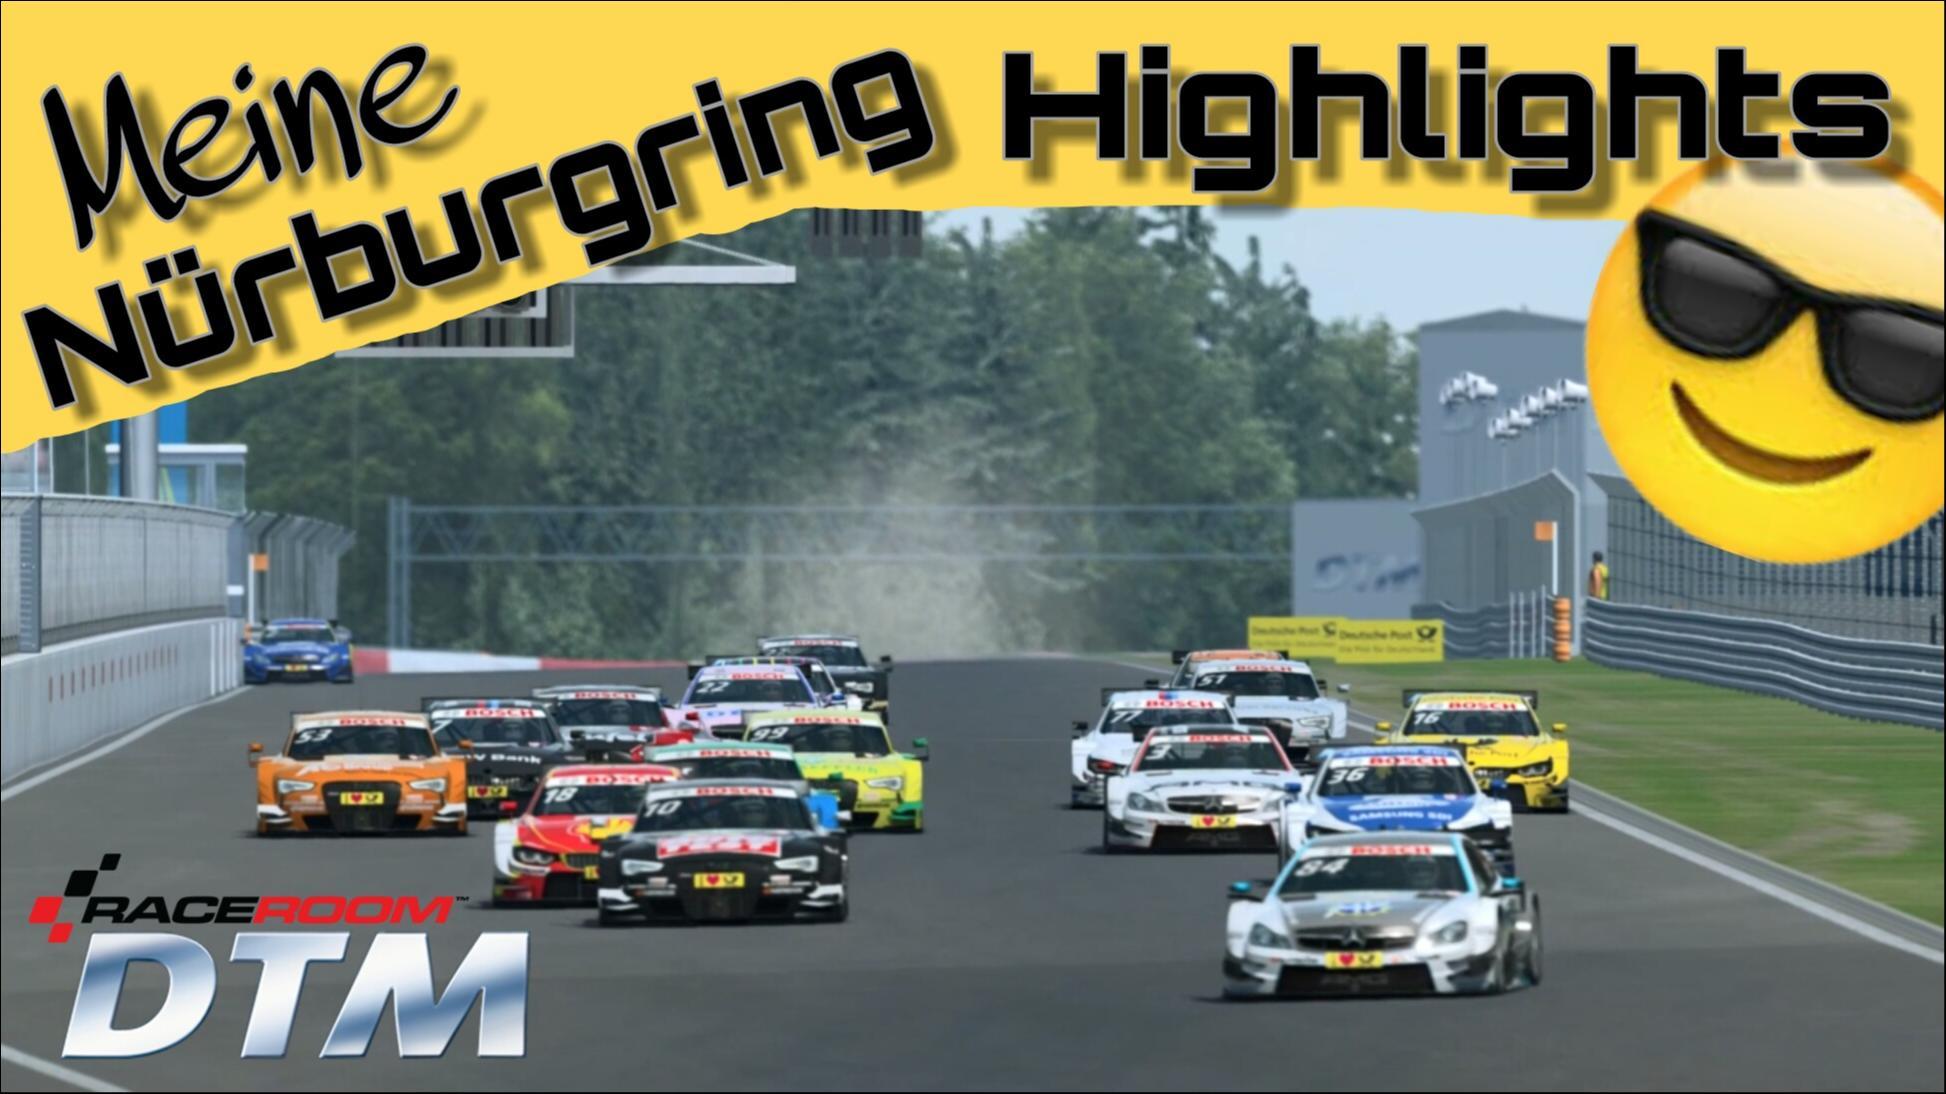 Highlights | DTM | NürburgRing | R3E RaceRooom 22.01.2017 by StrikeR